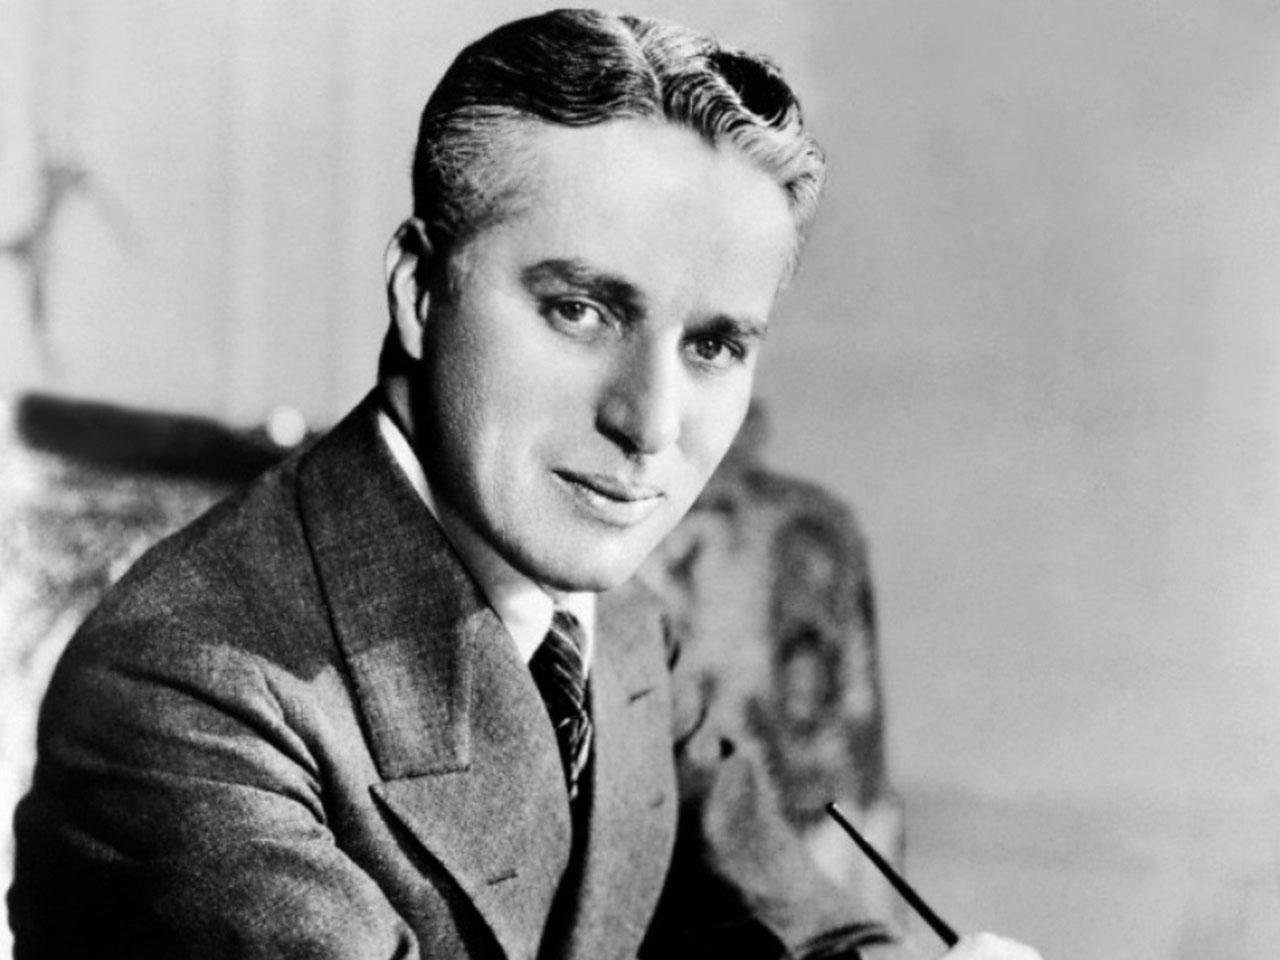 Charlie Chaplin Wallpaper Hd 3 Thumb